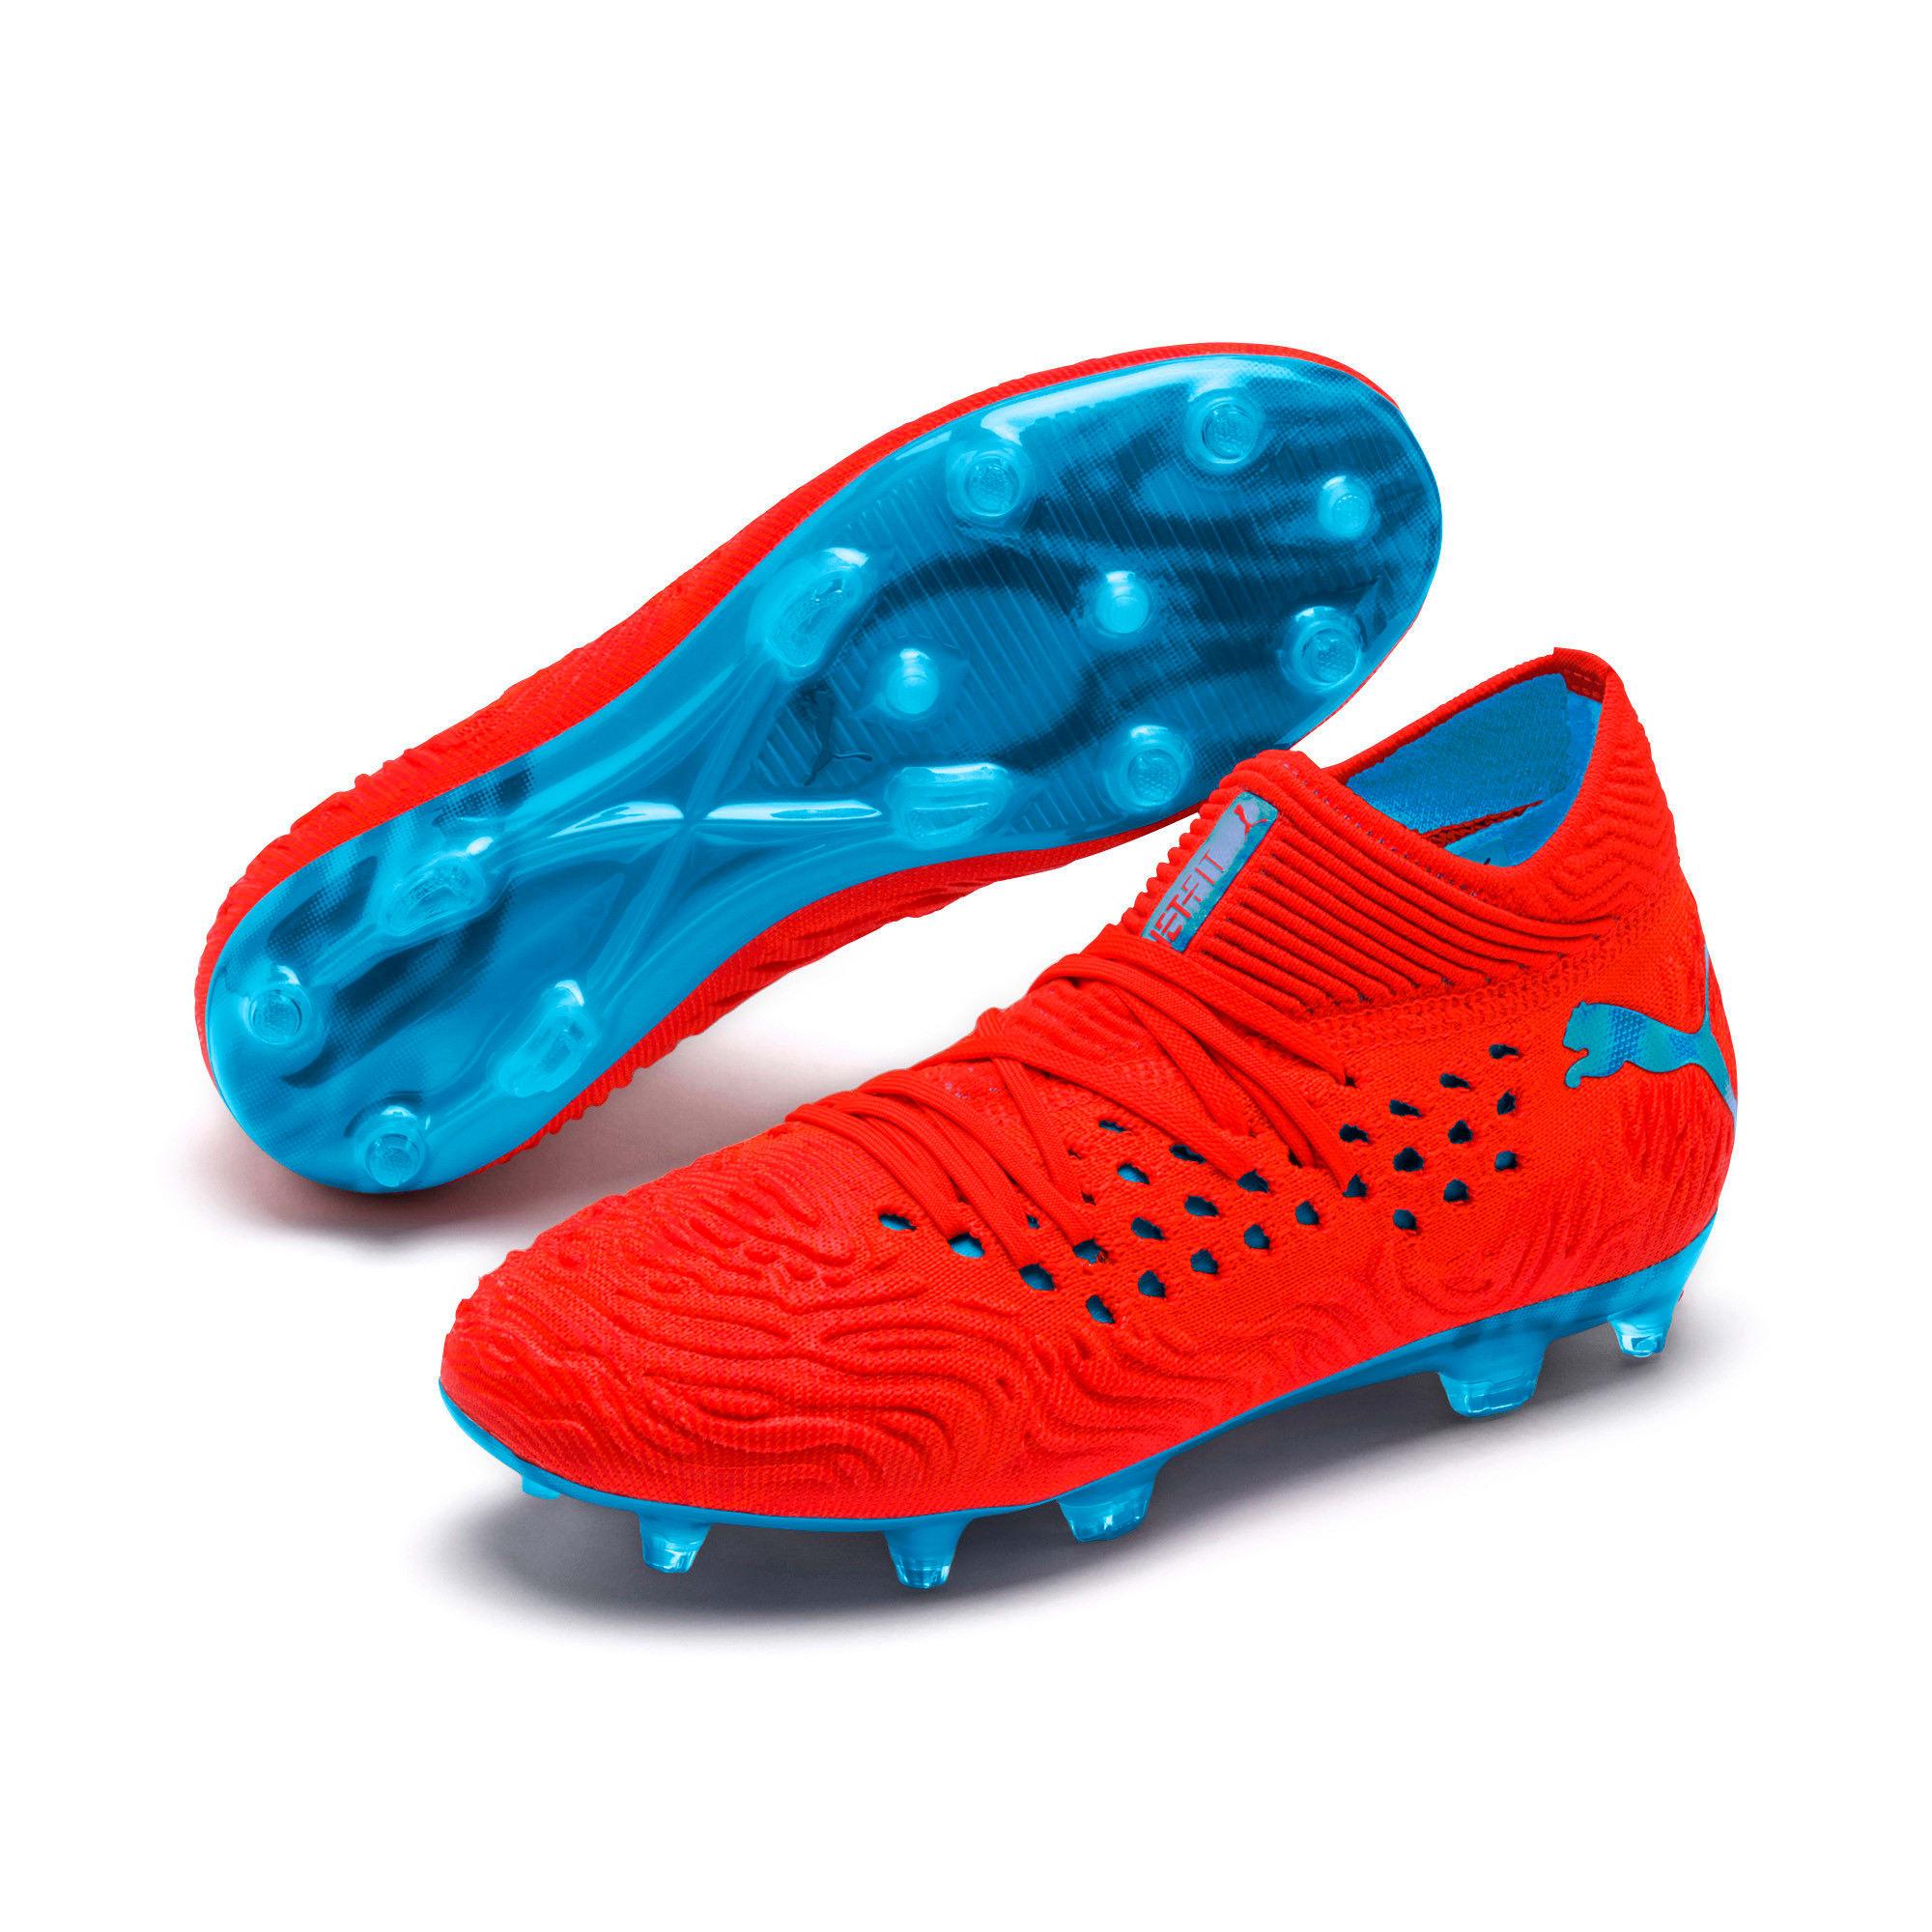 Thumbnail 2 of FUTURE 19.1 NETFIT FG/AG Soccer Cleats JR, Red Blast-Bleu Azur, medium